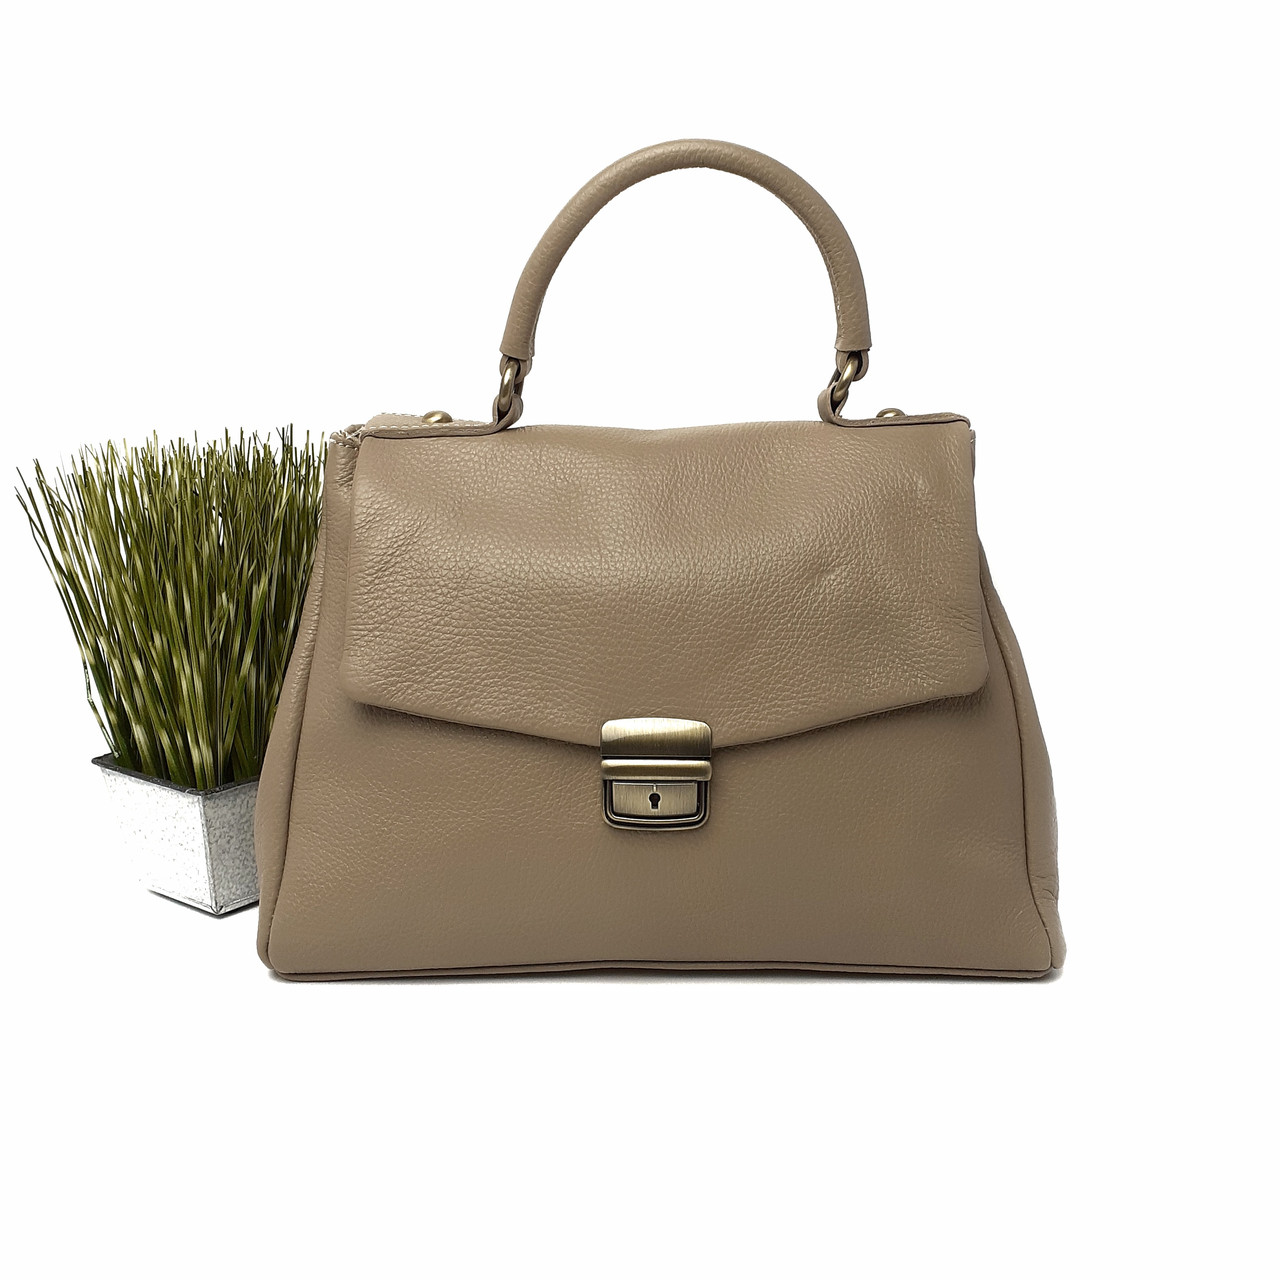 Класическая деловая женская кожанная сумка Арт.3179 ( BB) V.P. Італія